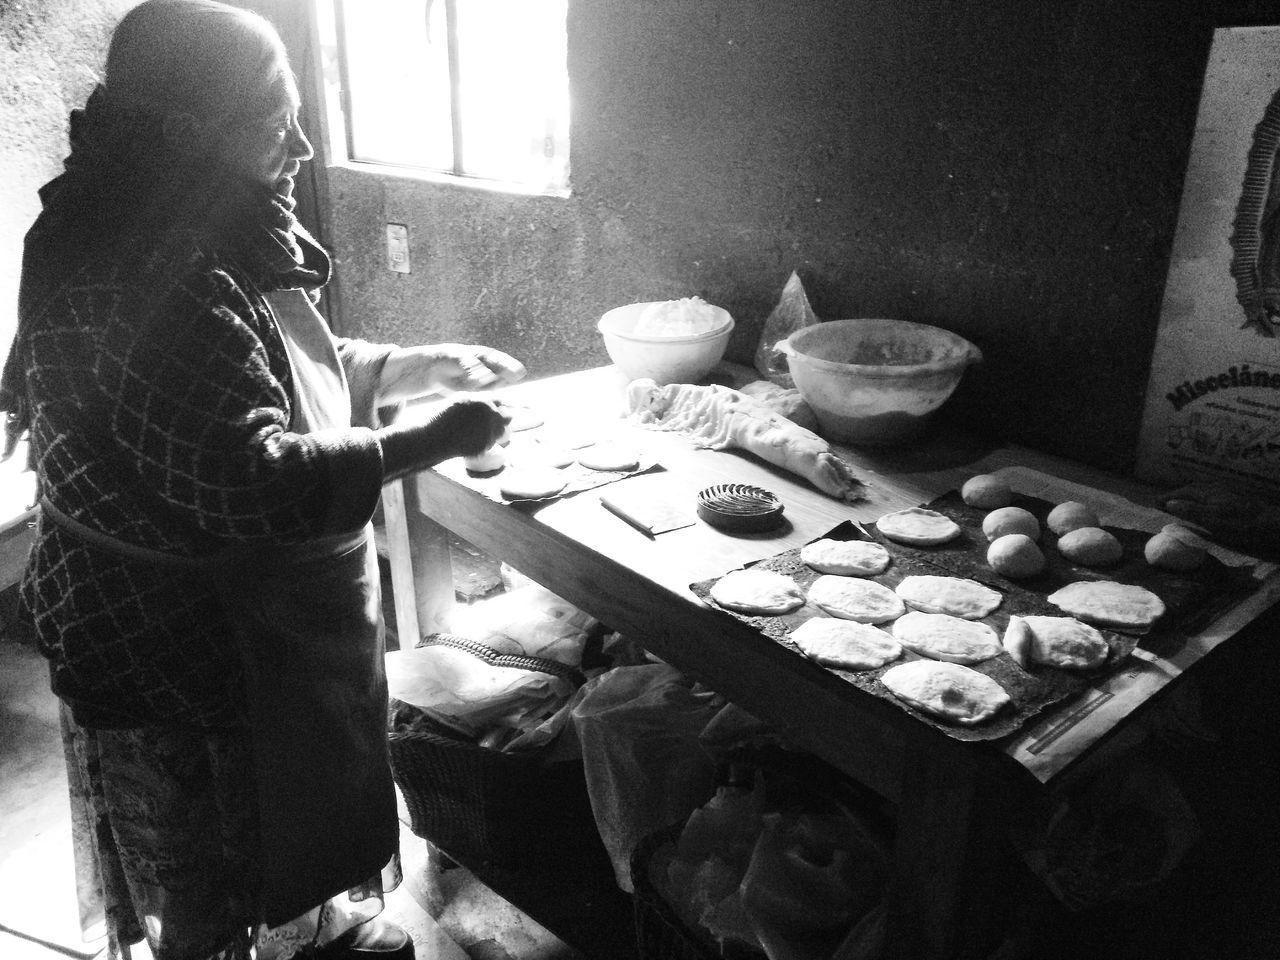 Blackandwhite Bread Roots Mexico Pinaldeamoles